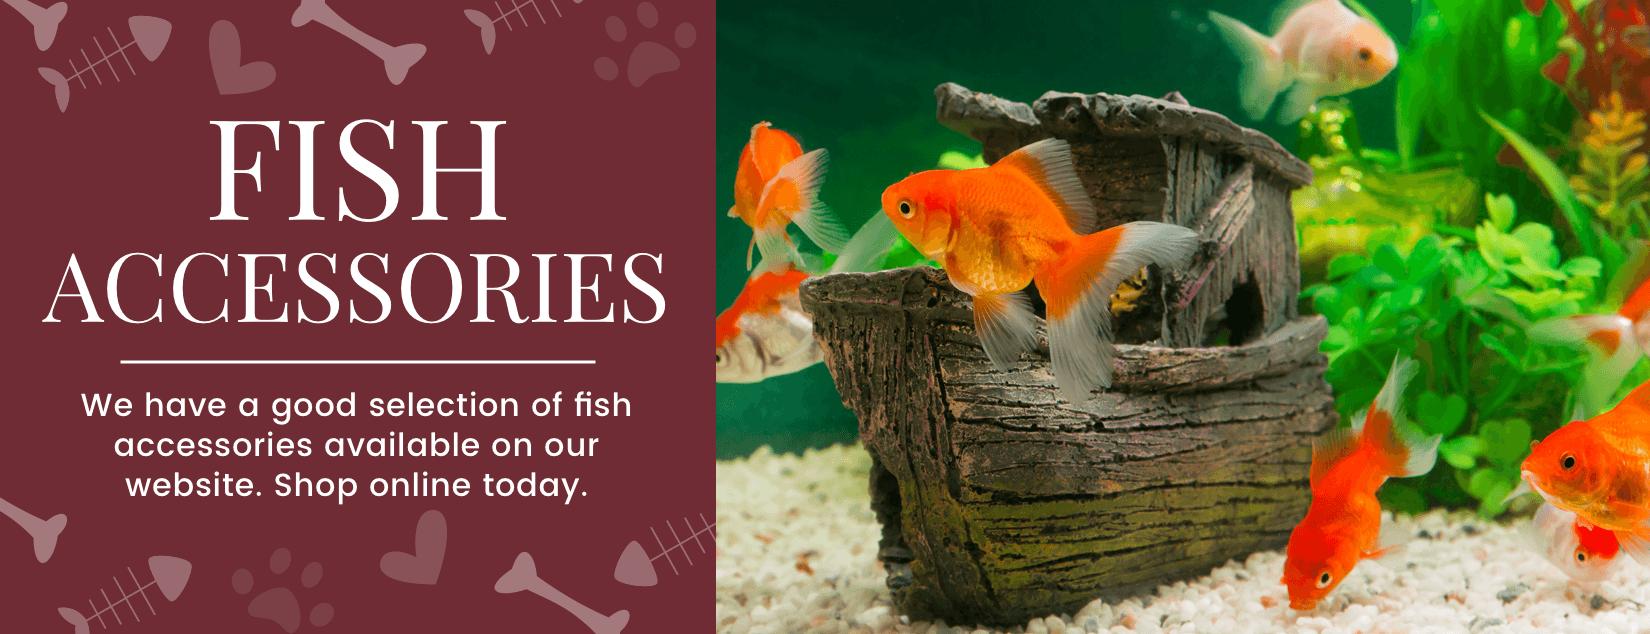 Fish Accessories